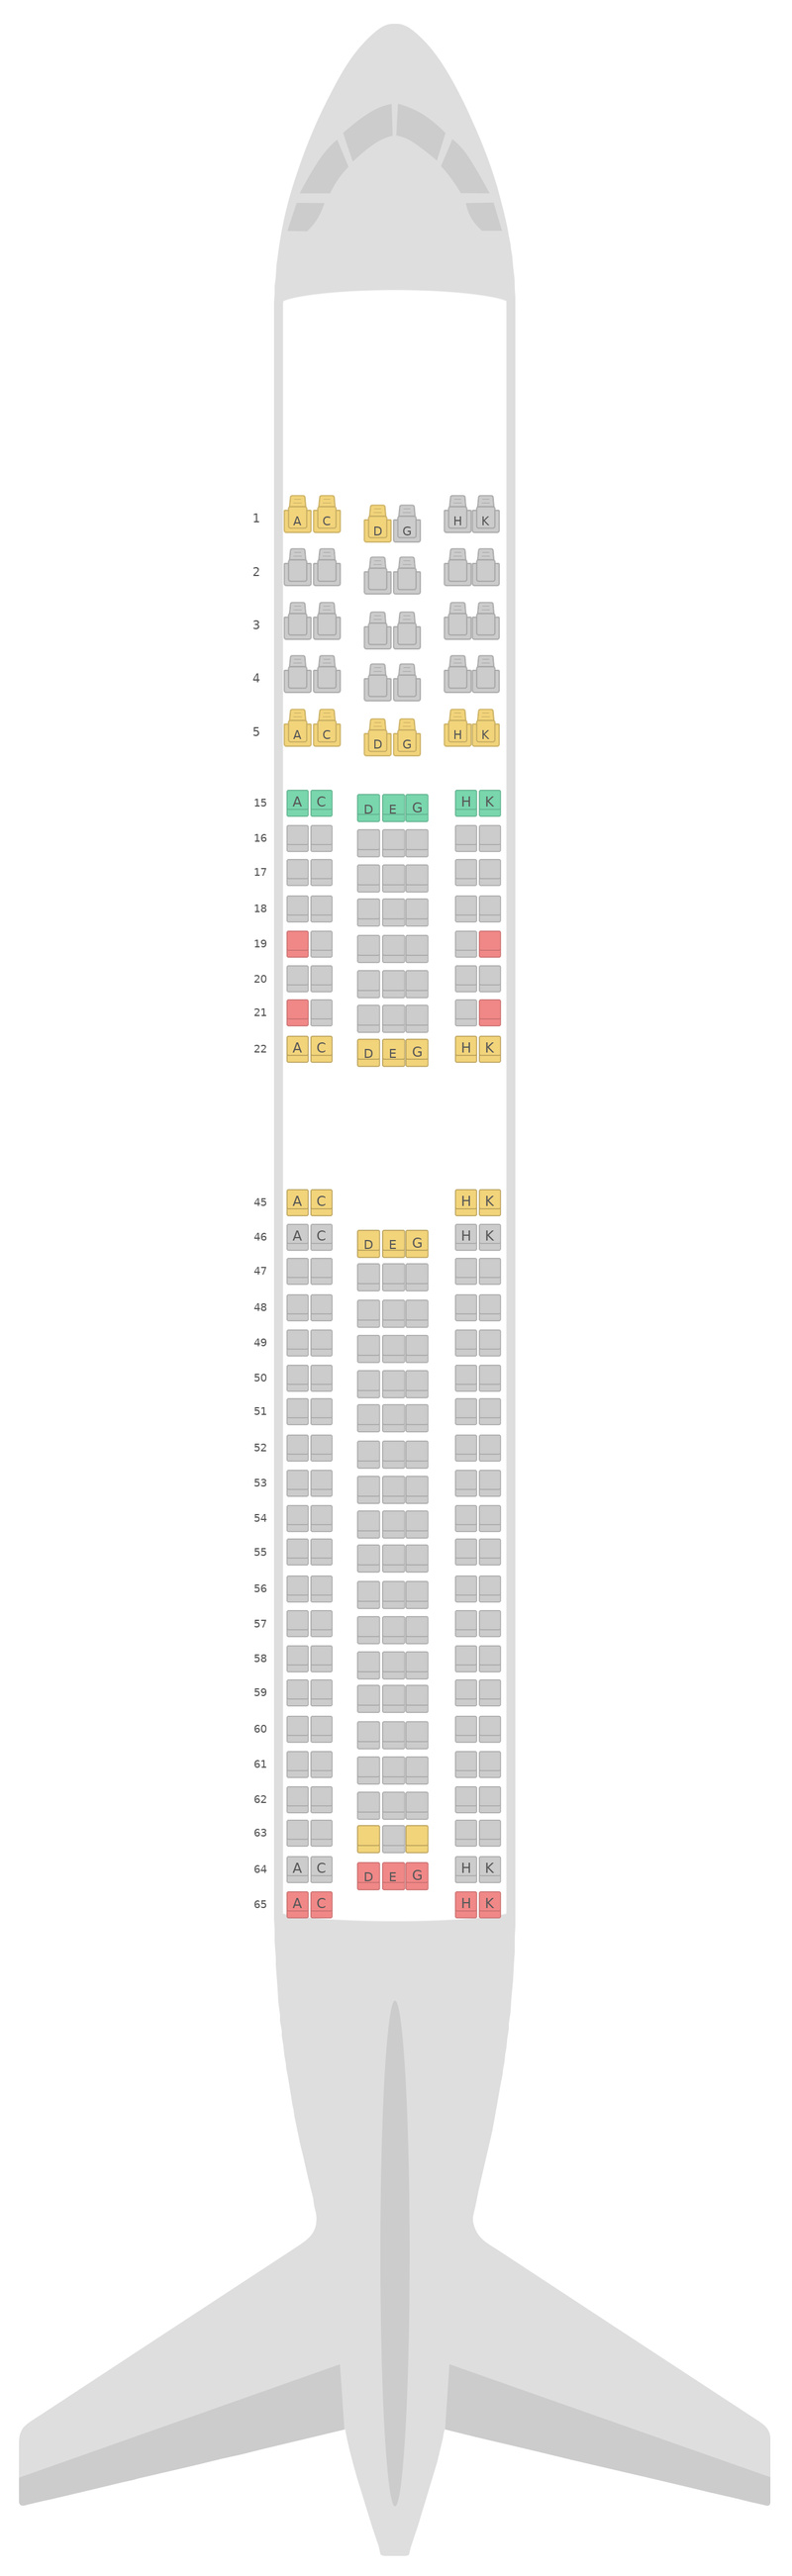 Схема салона Боинг 767-300ER v4 Японские авиалинии